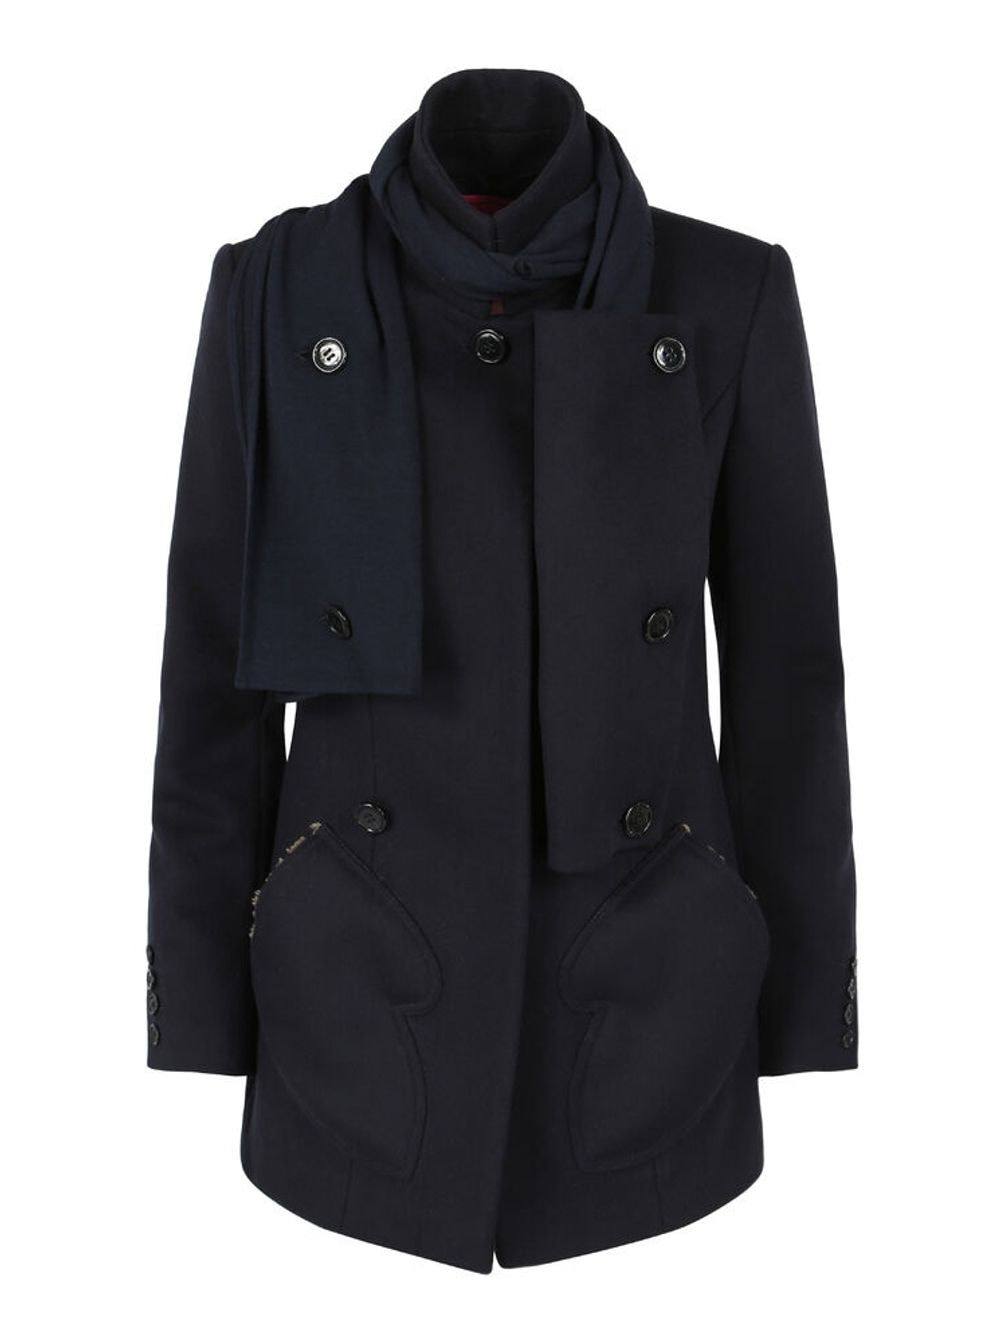 Original Vinter - Short- Nordic Blue